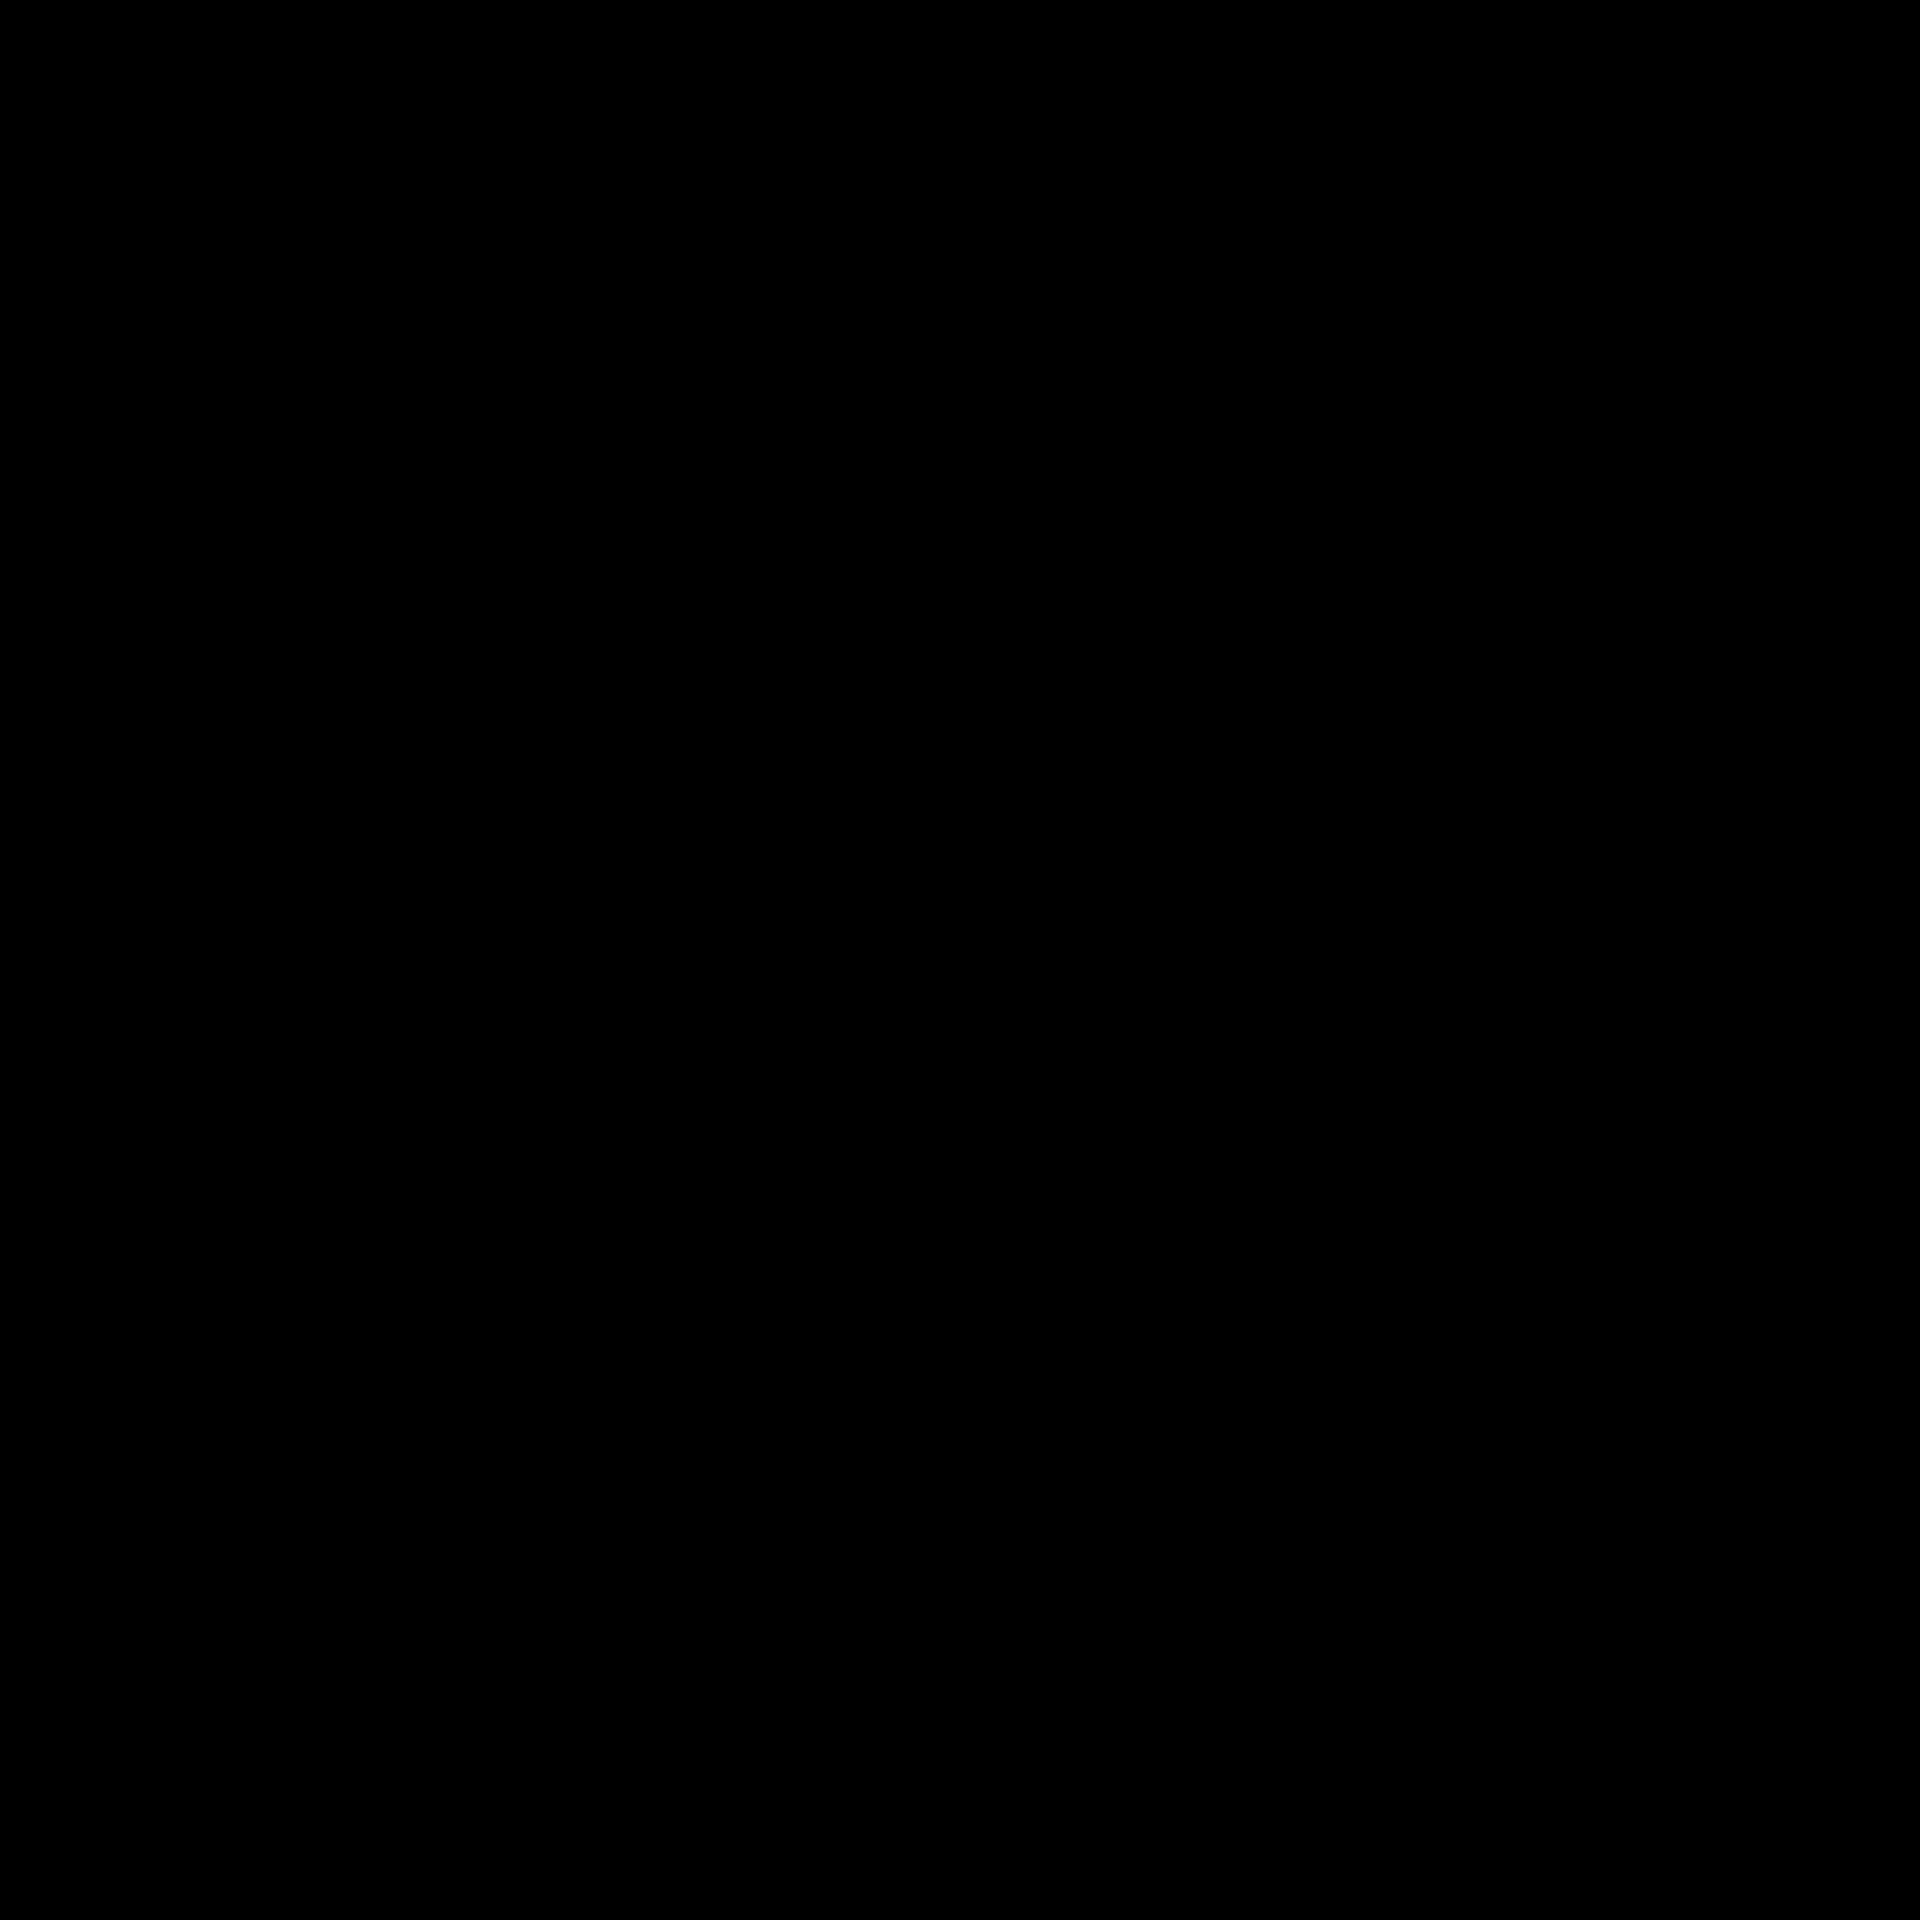 _MN_4169-2